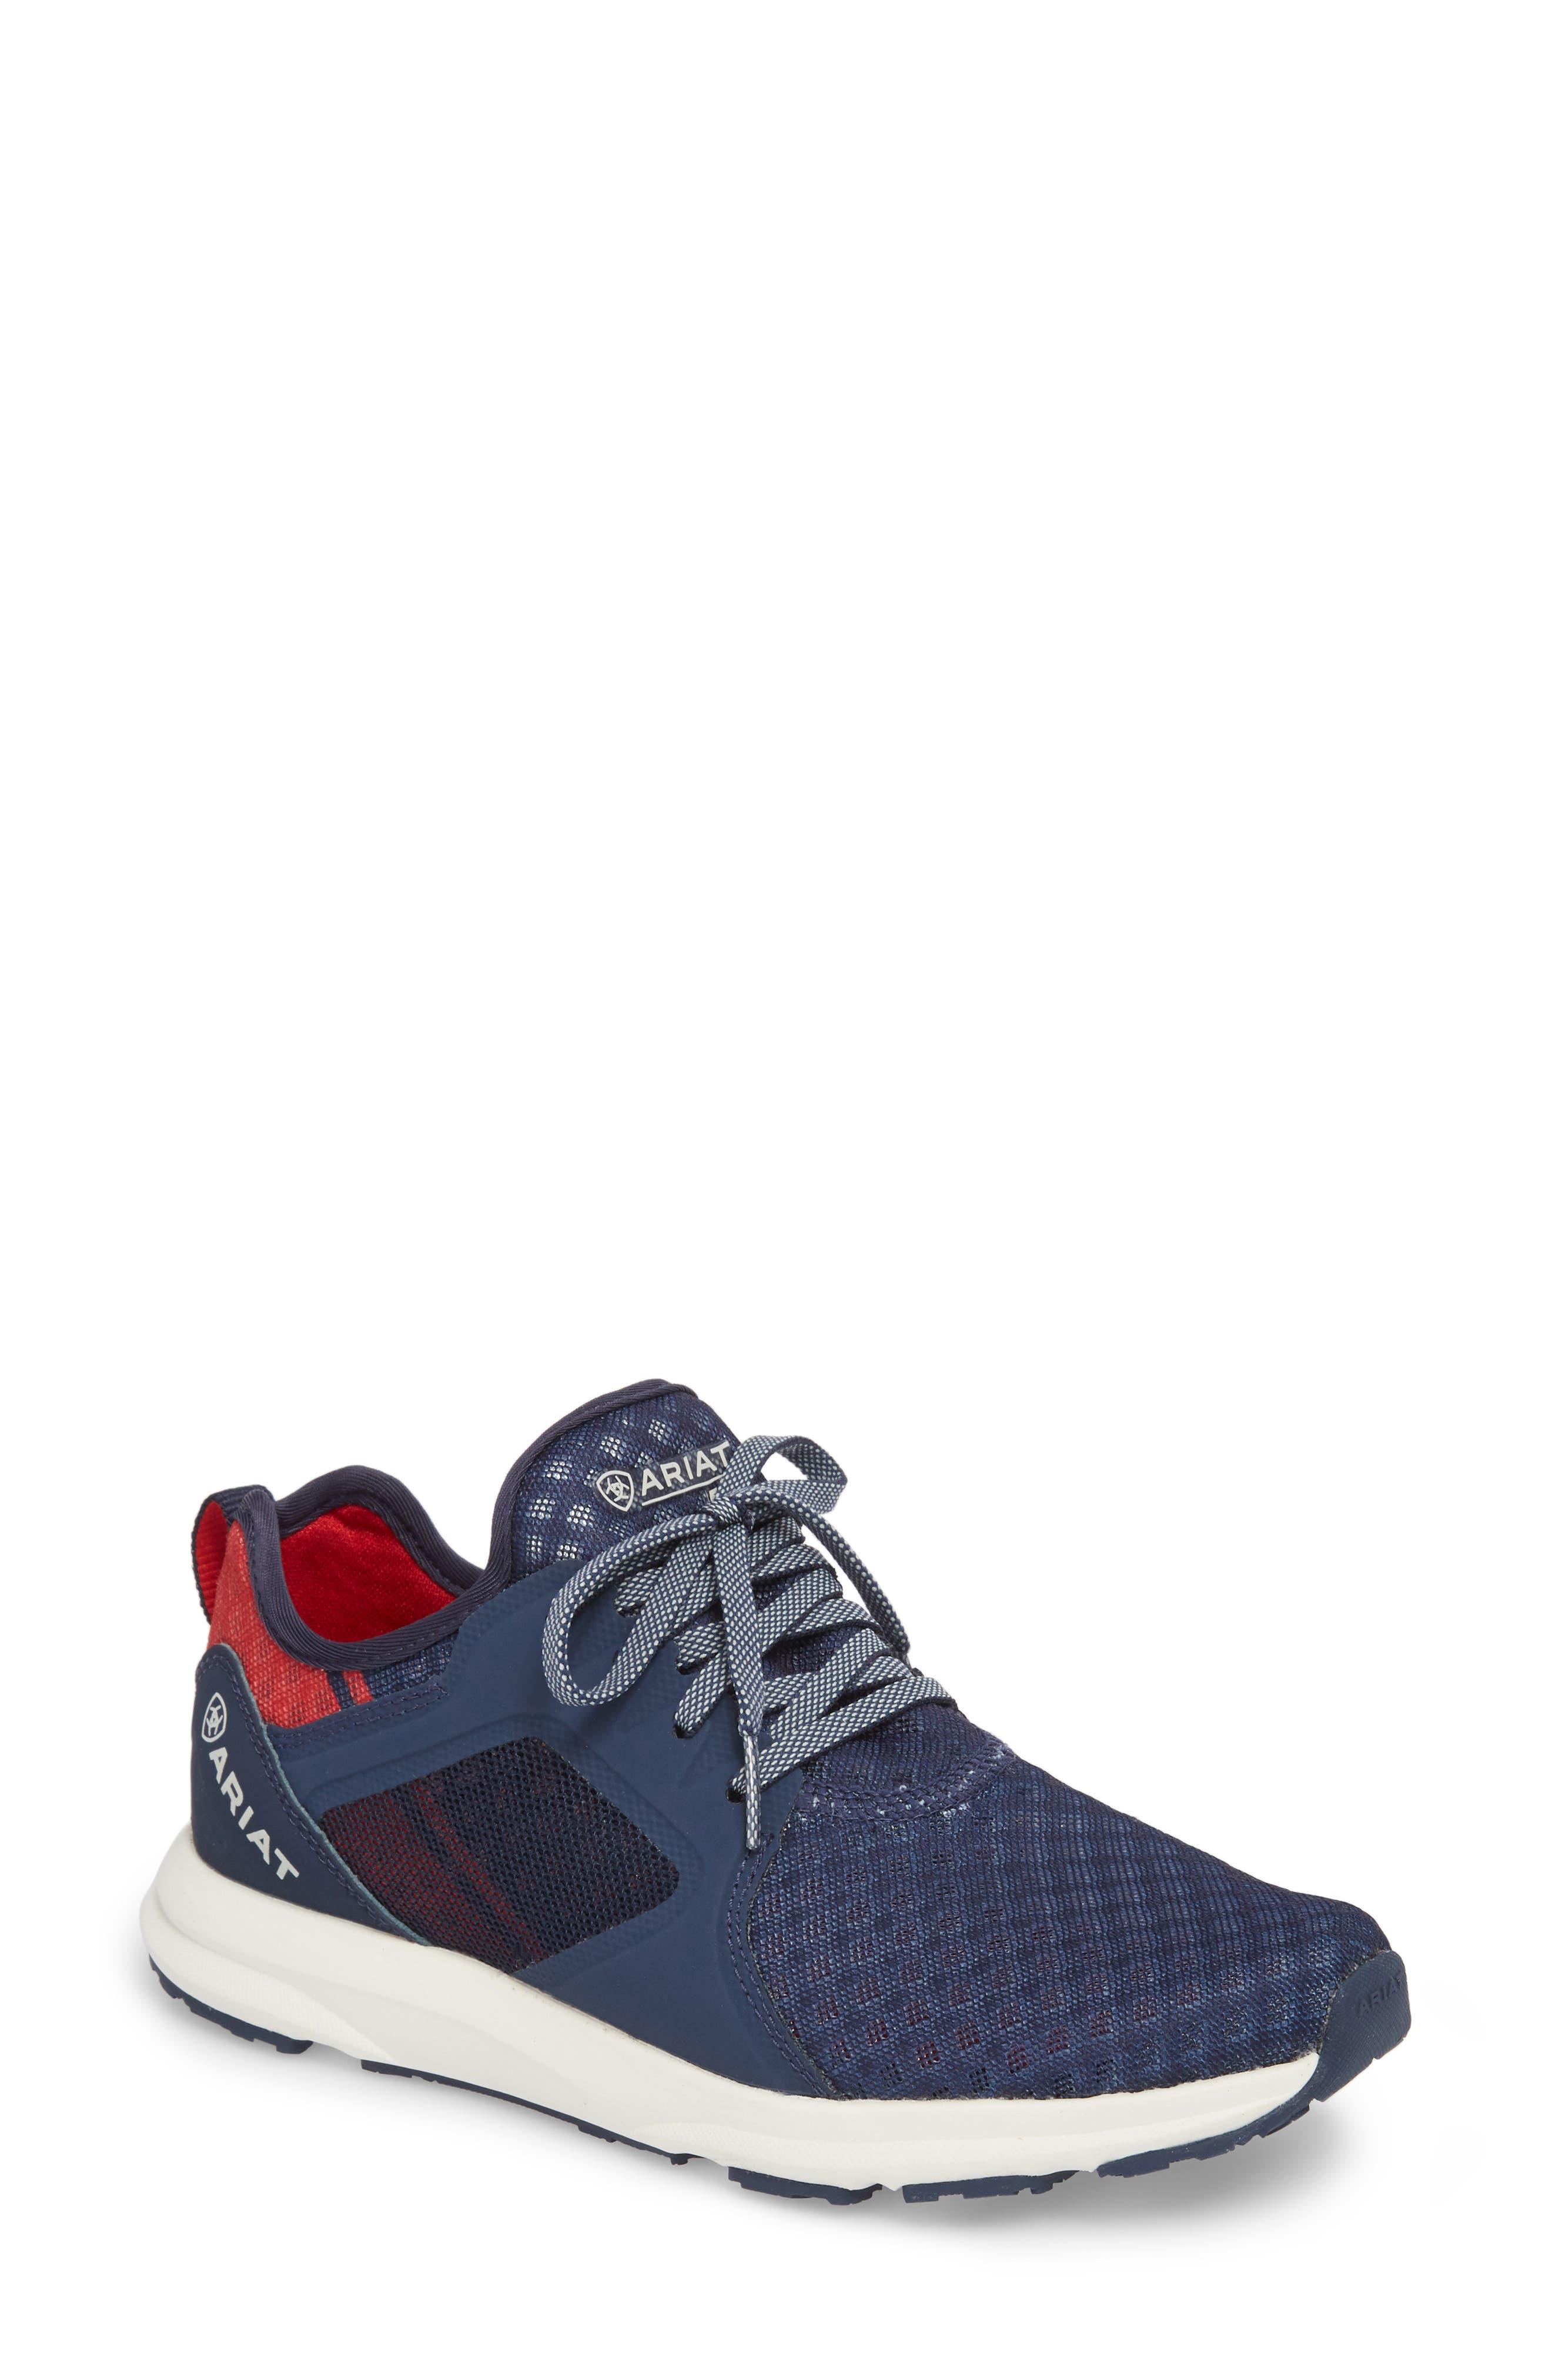 Ariat Fuse Print Sneaker- Blue